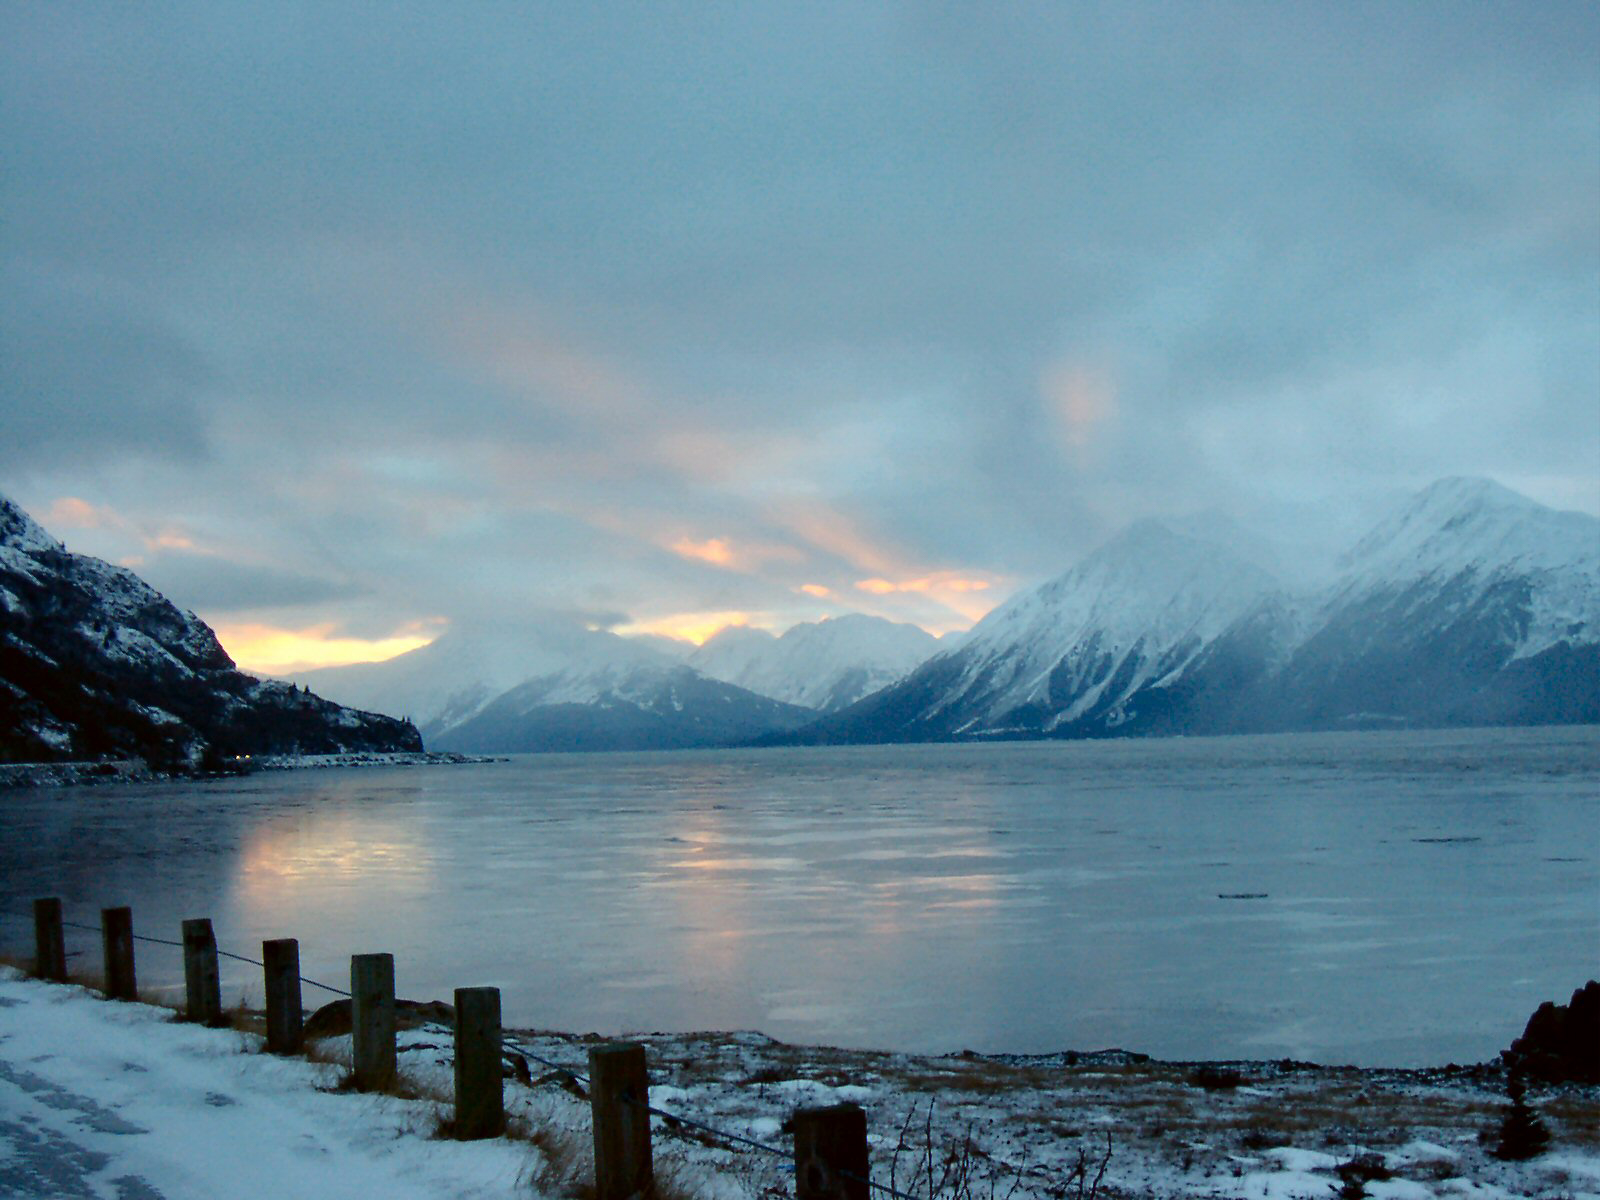 Winter House Western Canada And Alaska Derek Chambers Photography